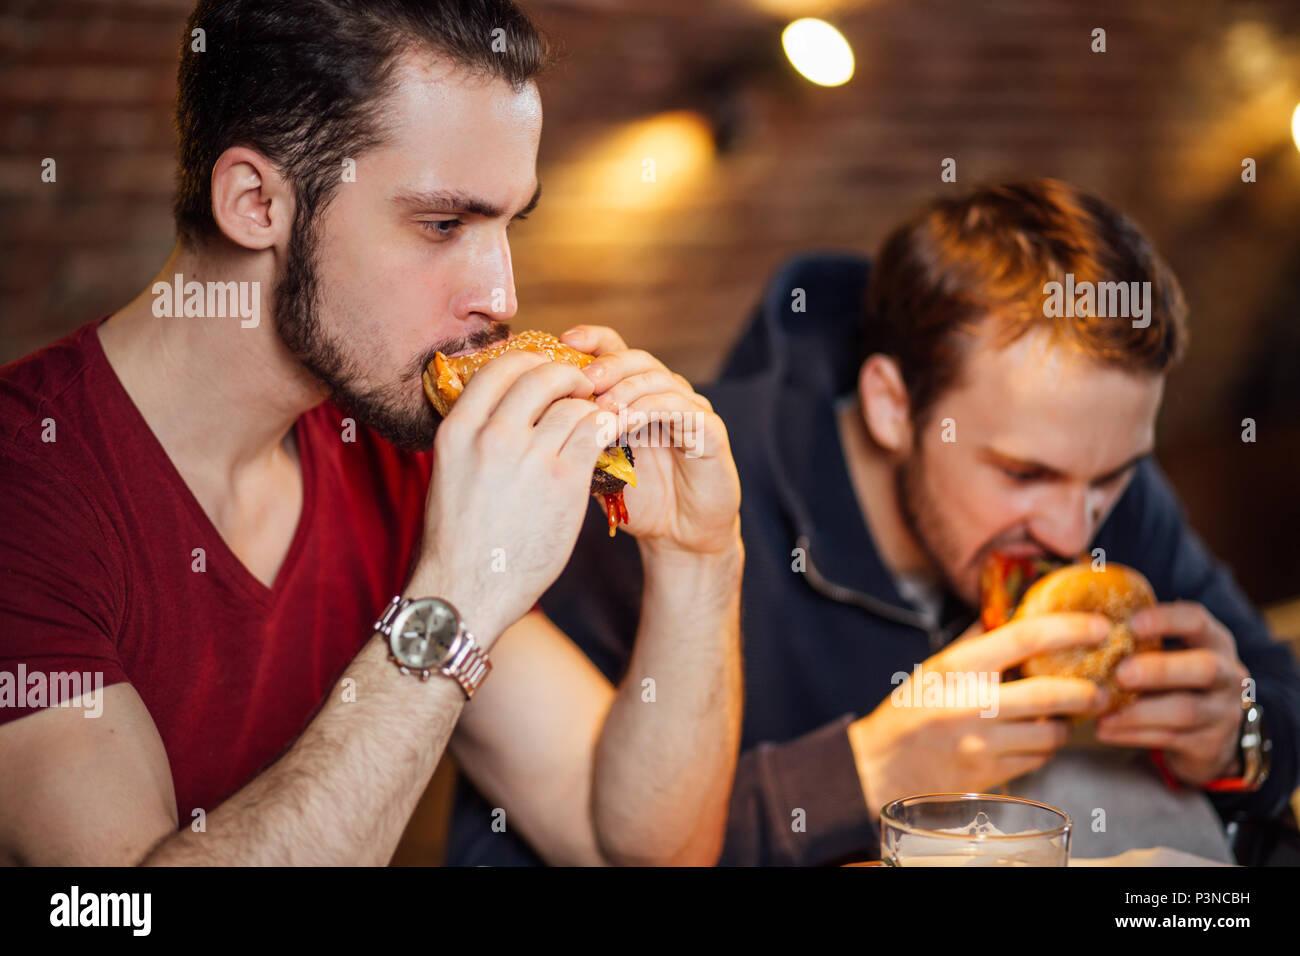 Due felici amici maschi mangiare hamburger gustosi in bar. Immagini Stock